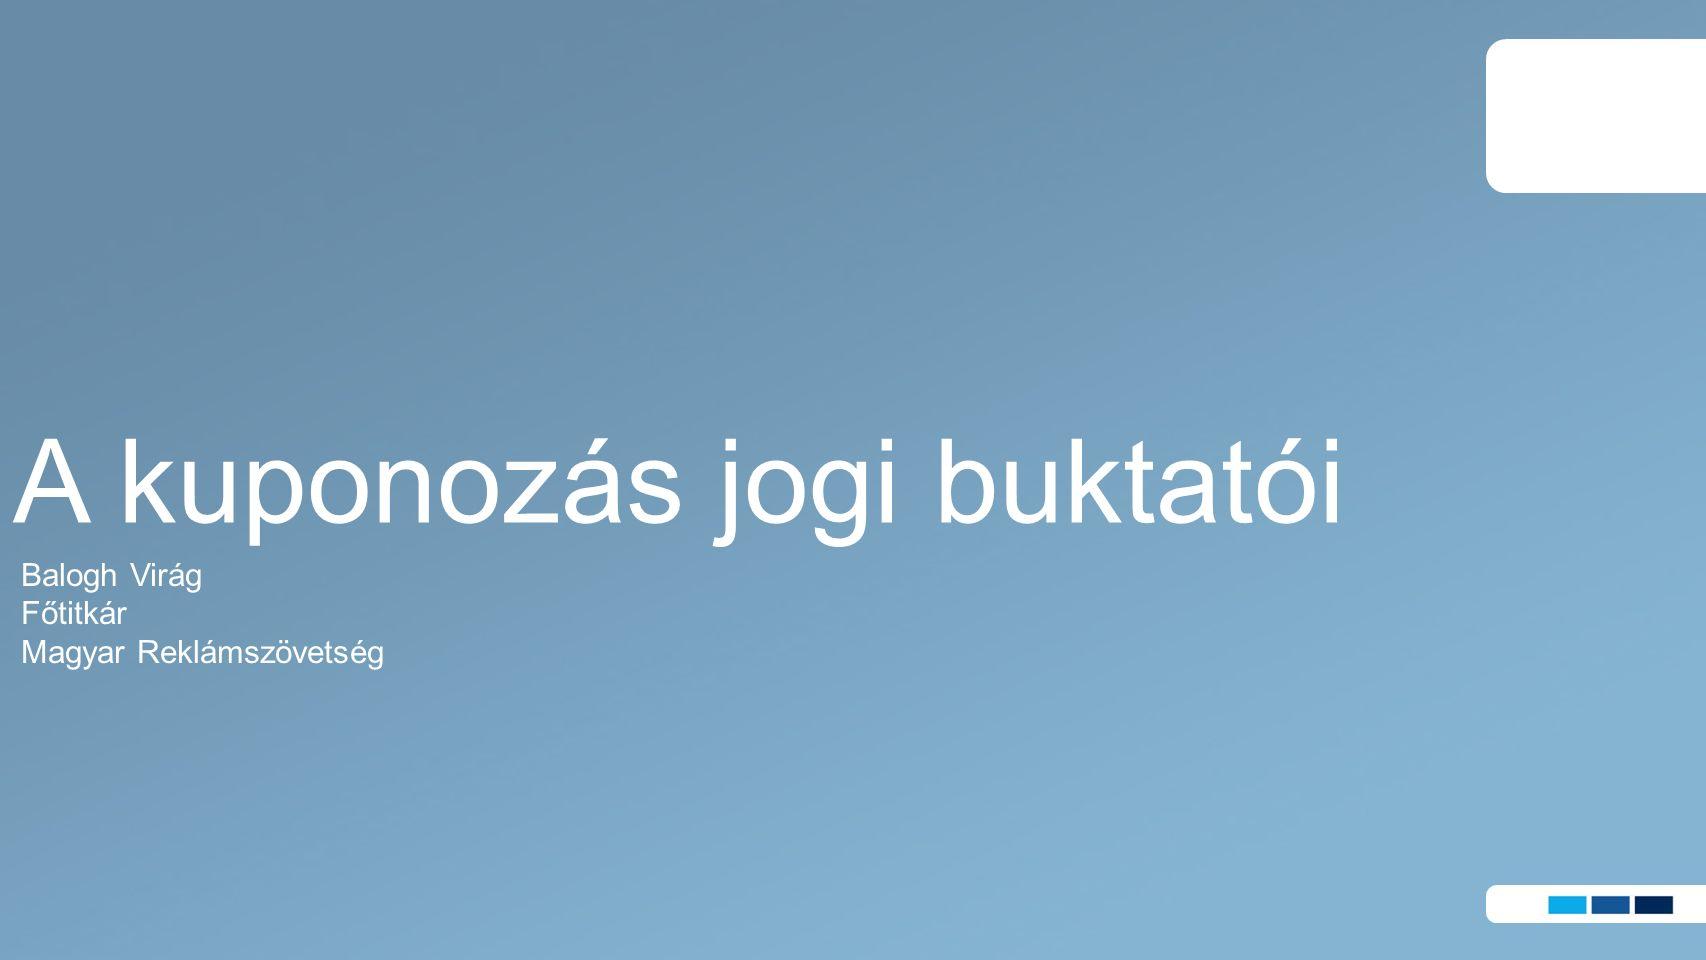 Balogh Virág Főtitkár Magyar Reklámszövetség A kuponozás jogi buktatói